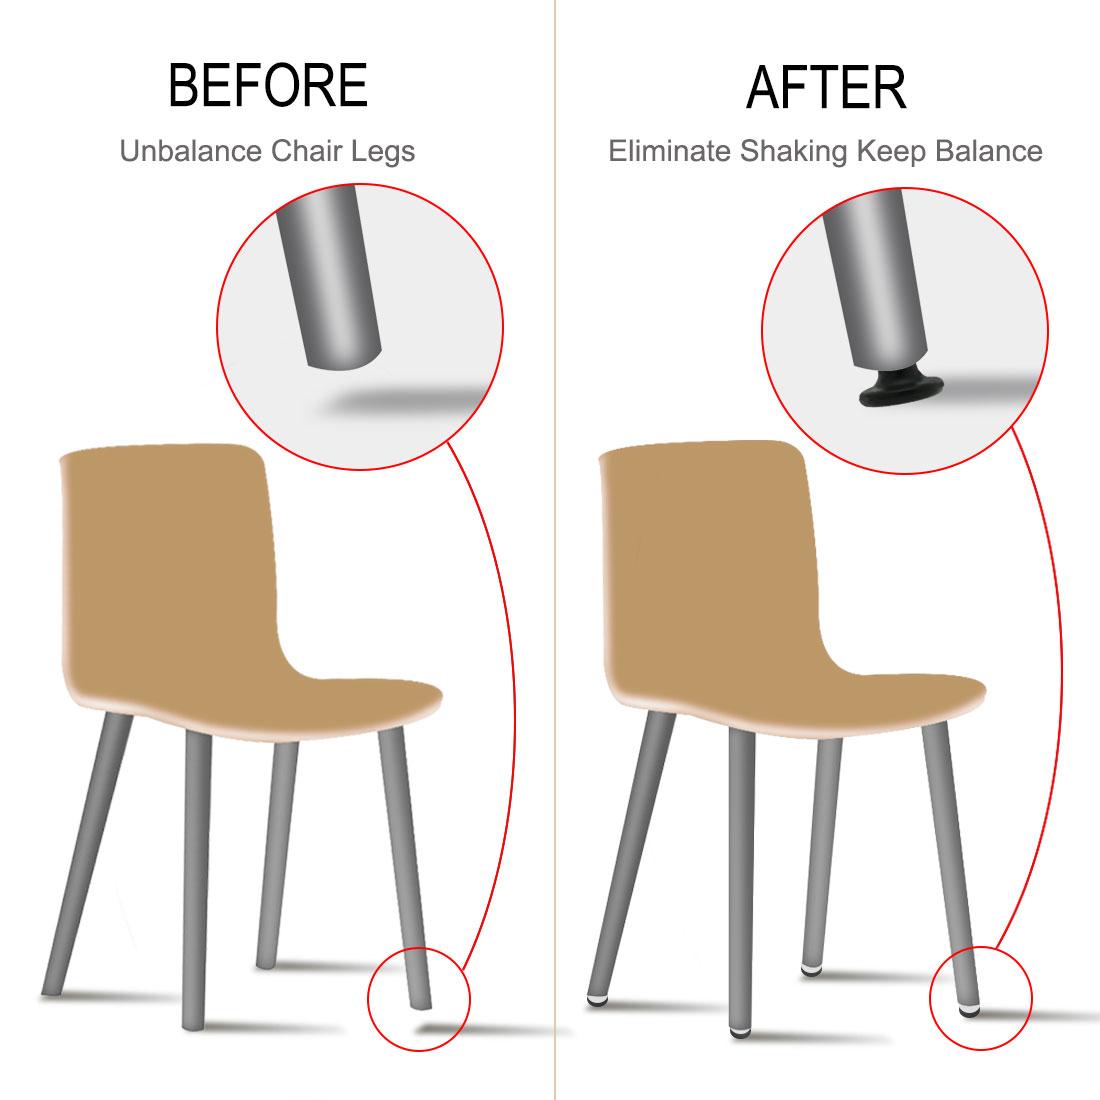 M8 x 18 x 45mm Furniture Glide Leveling Feet Plastic Adjuster for Chair Leg 8pcs - image 2 de 7